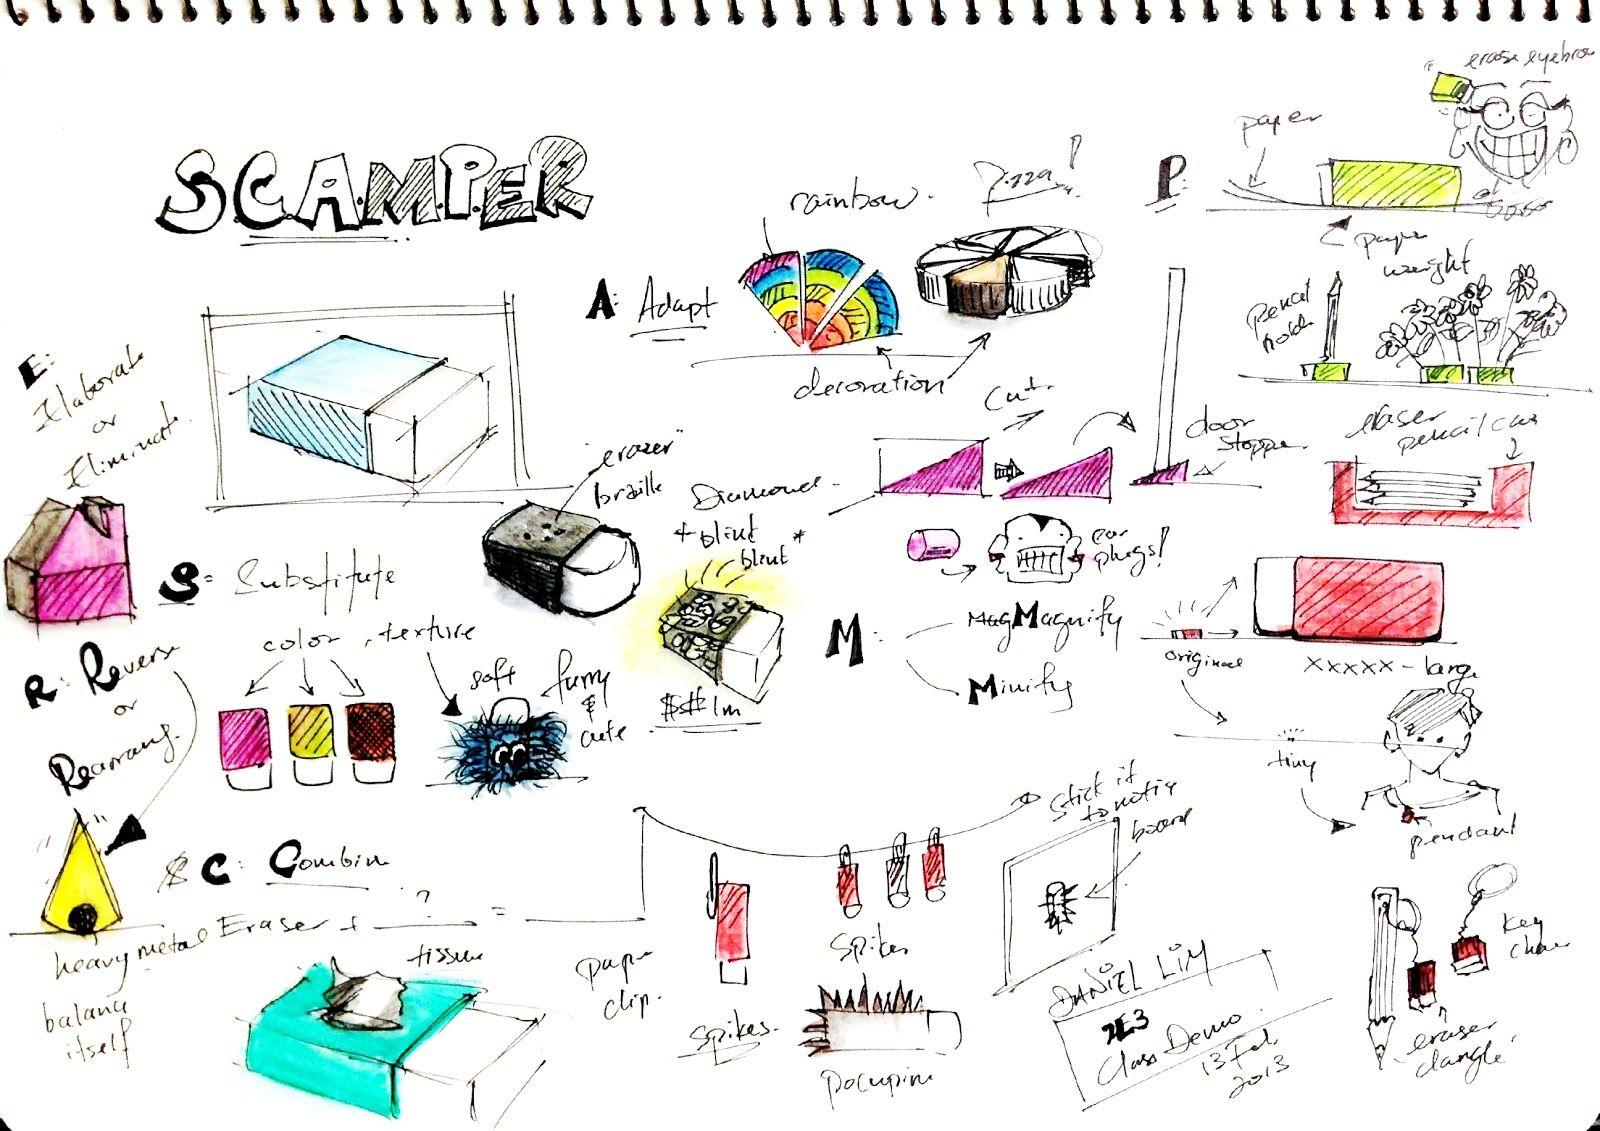 Scamper Designjournalsosspot 01 01